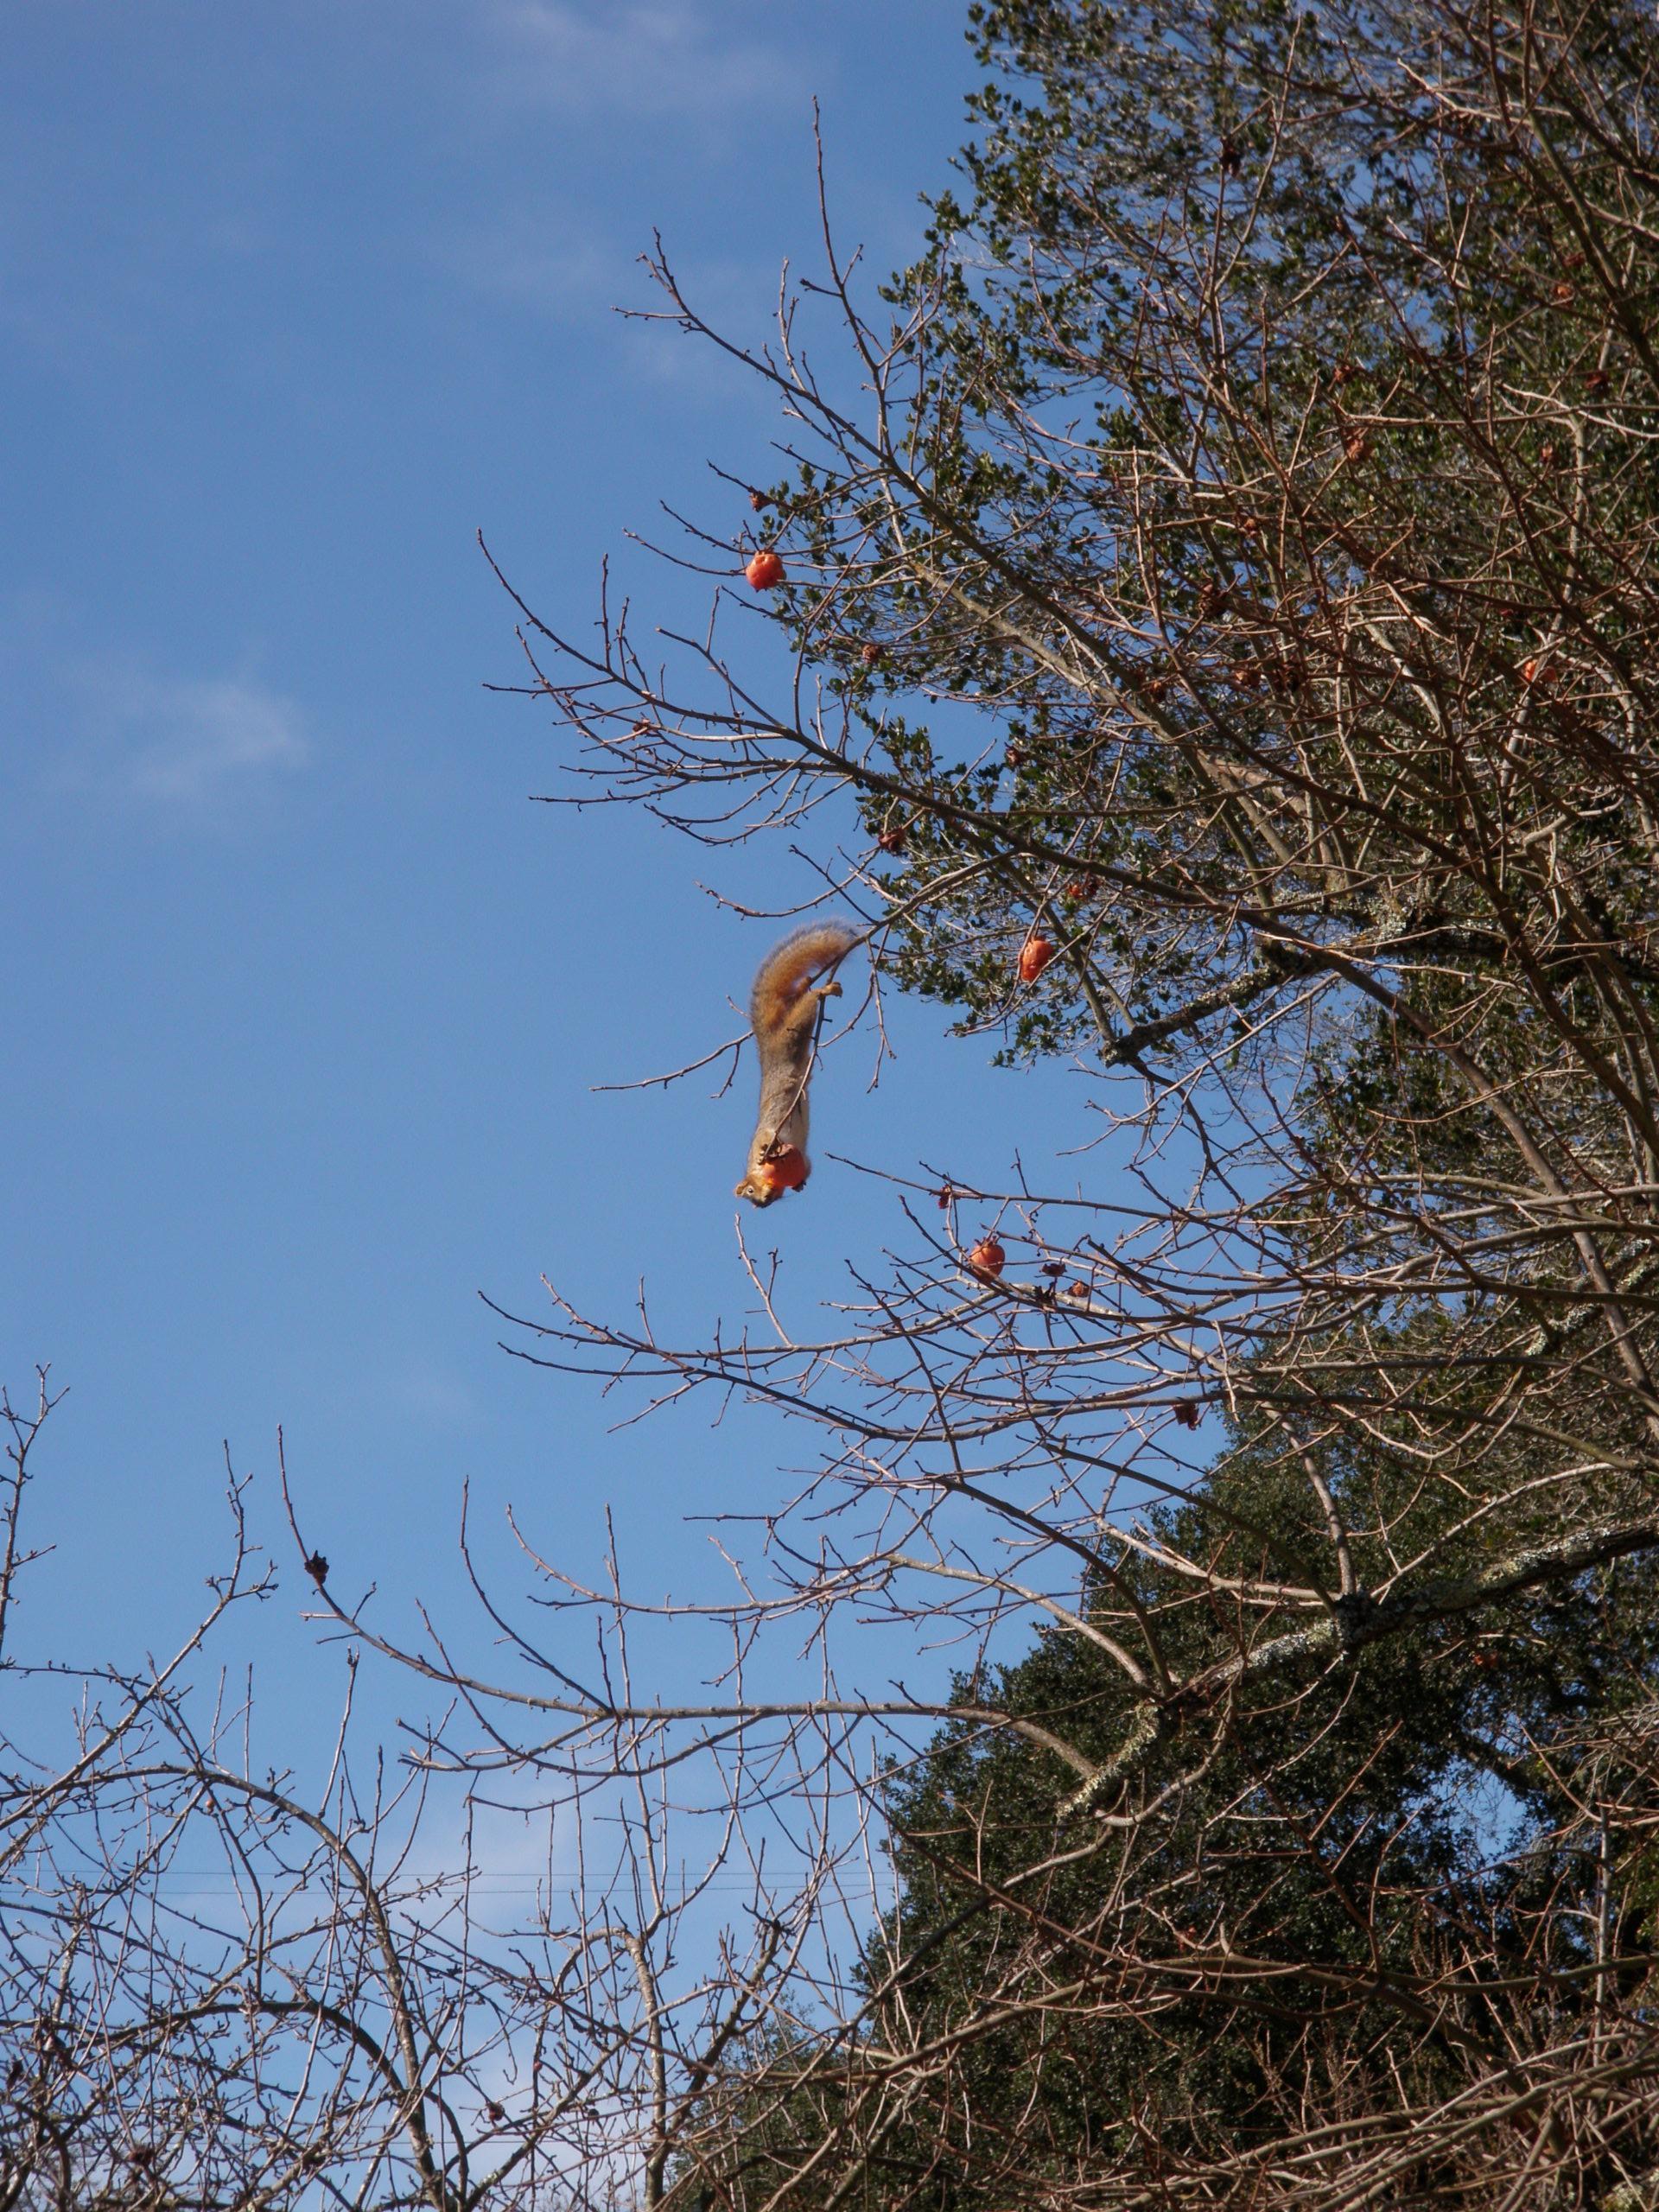 red squirrel, persimmon, persimmon tree, spore lore, habitat it and they will come, tony mcguigan, garden, gardening, gardens, native plants, permaculture, wildlife garden, habitat garden, conservation,